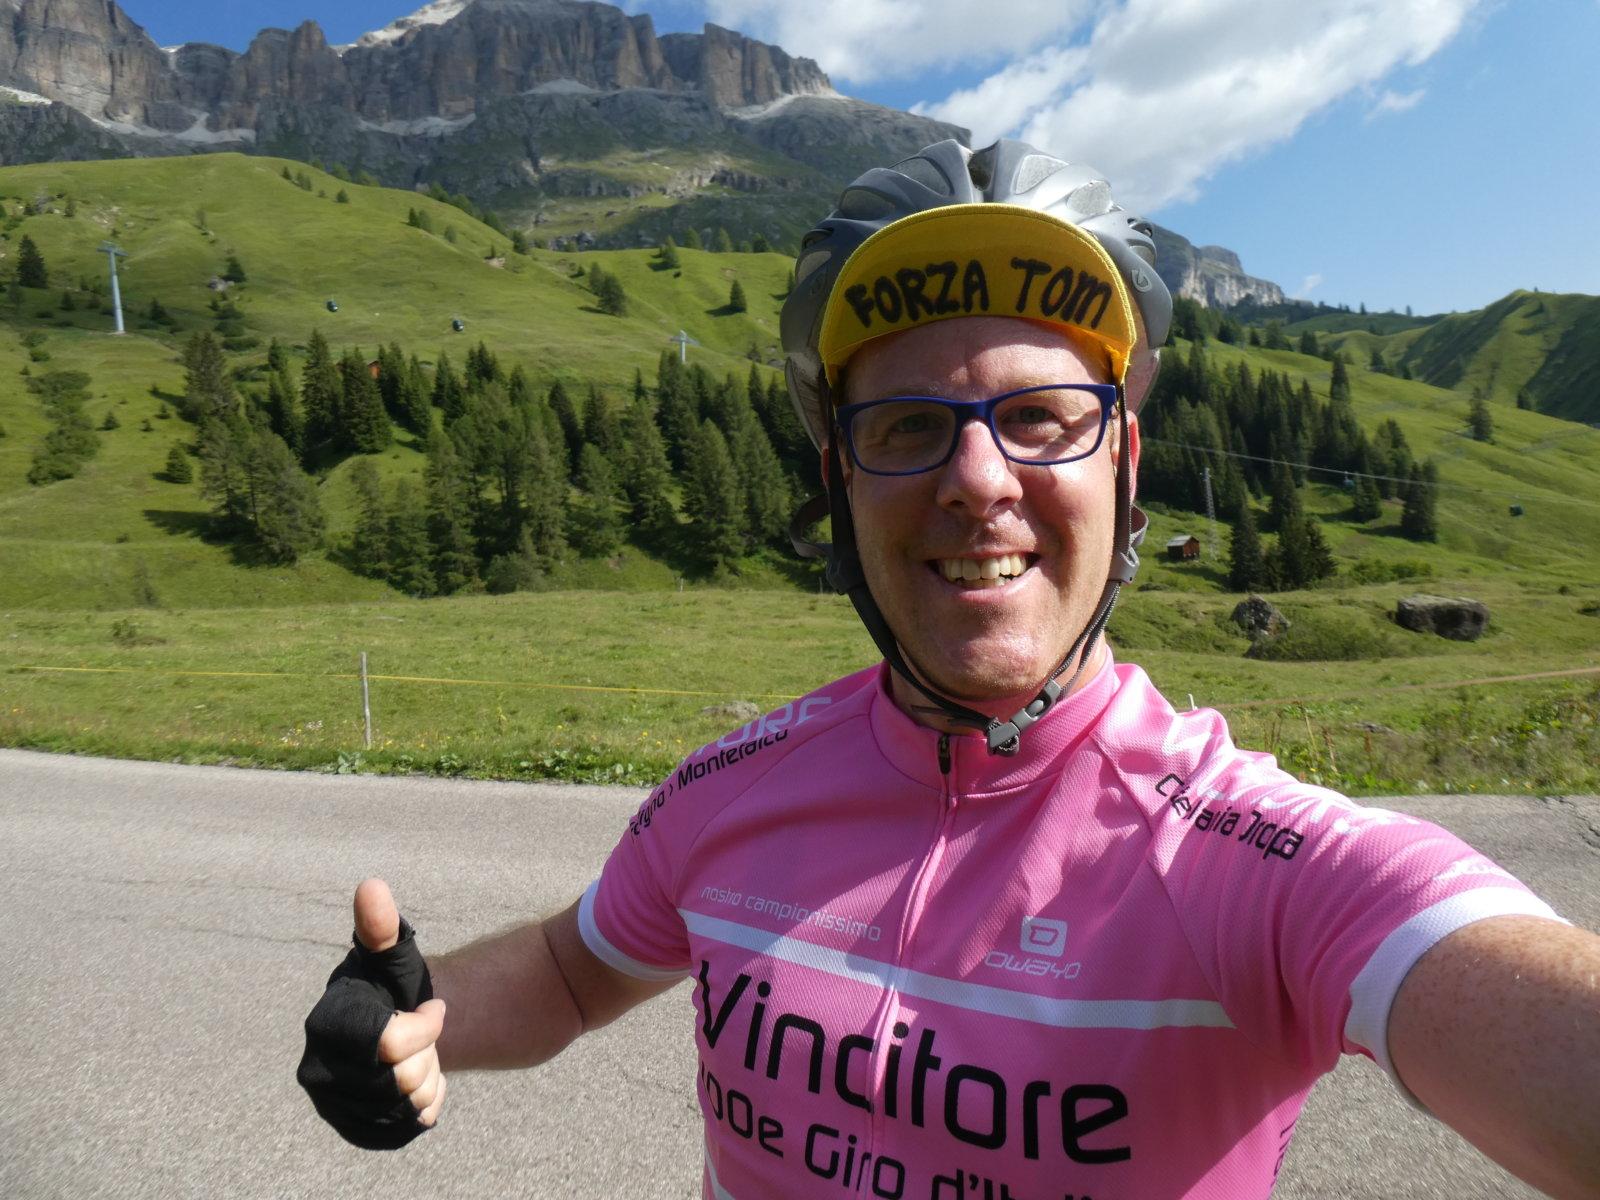 Vincitore Upcycle your life giro 2017 wielershirt